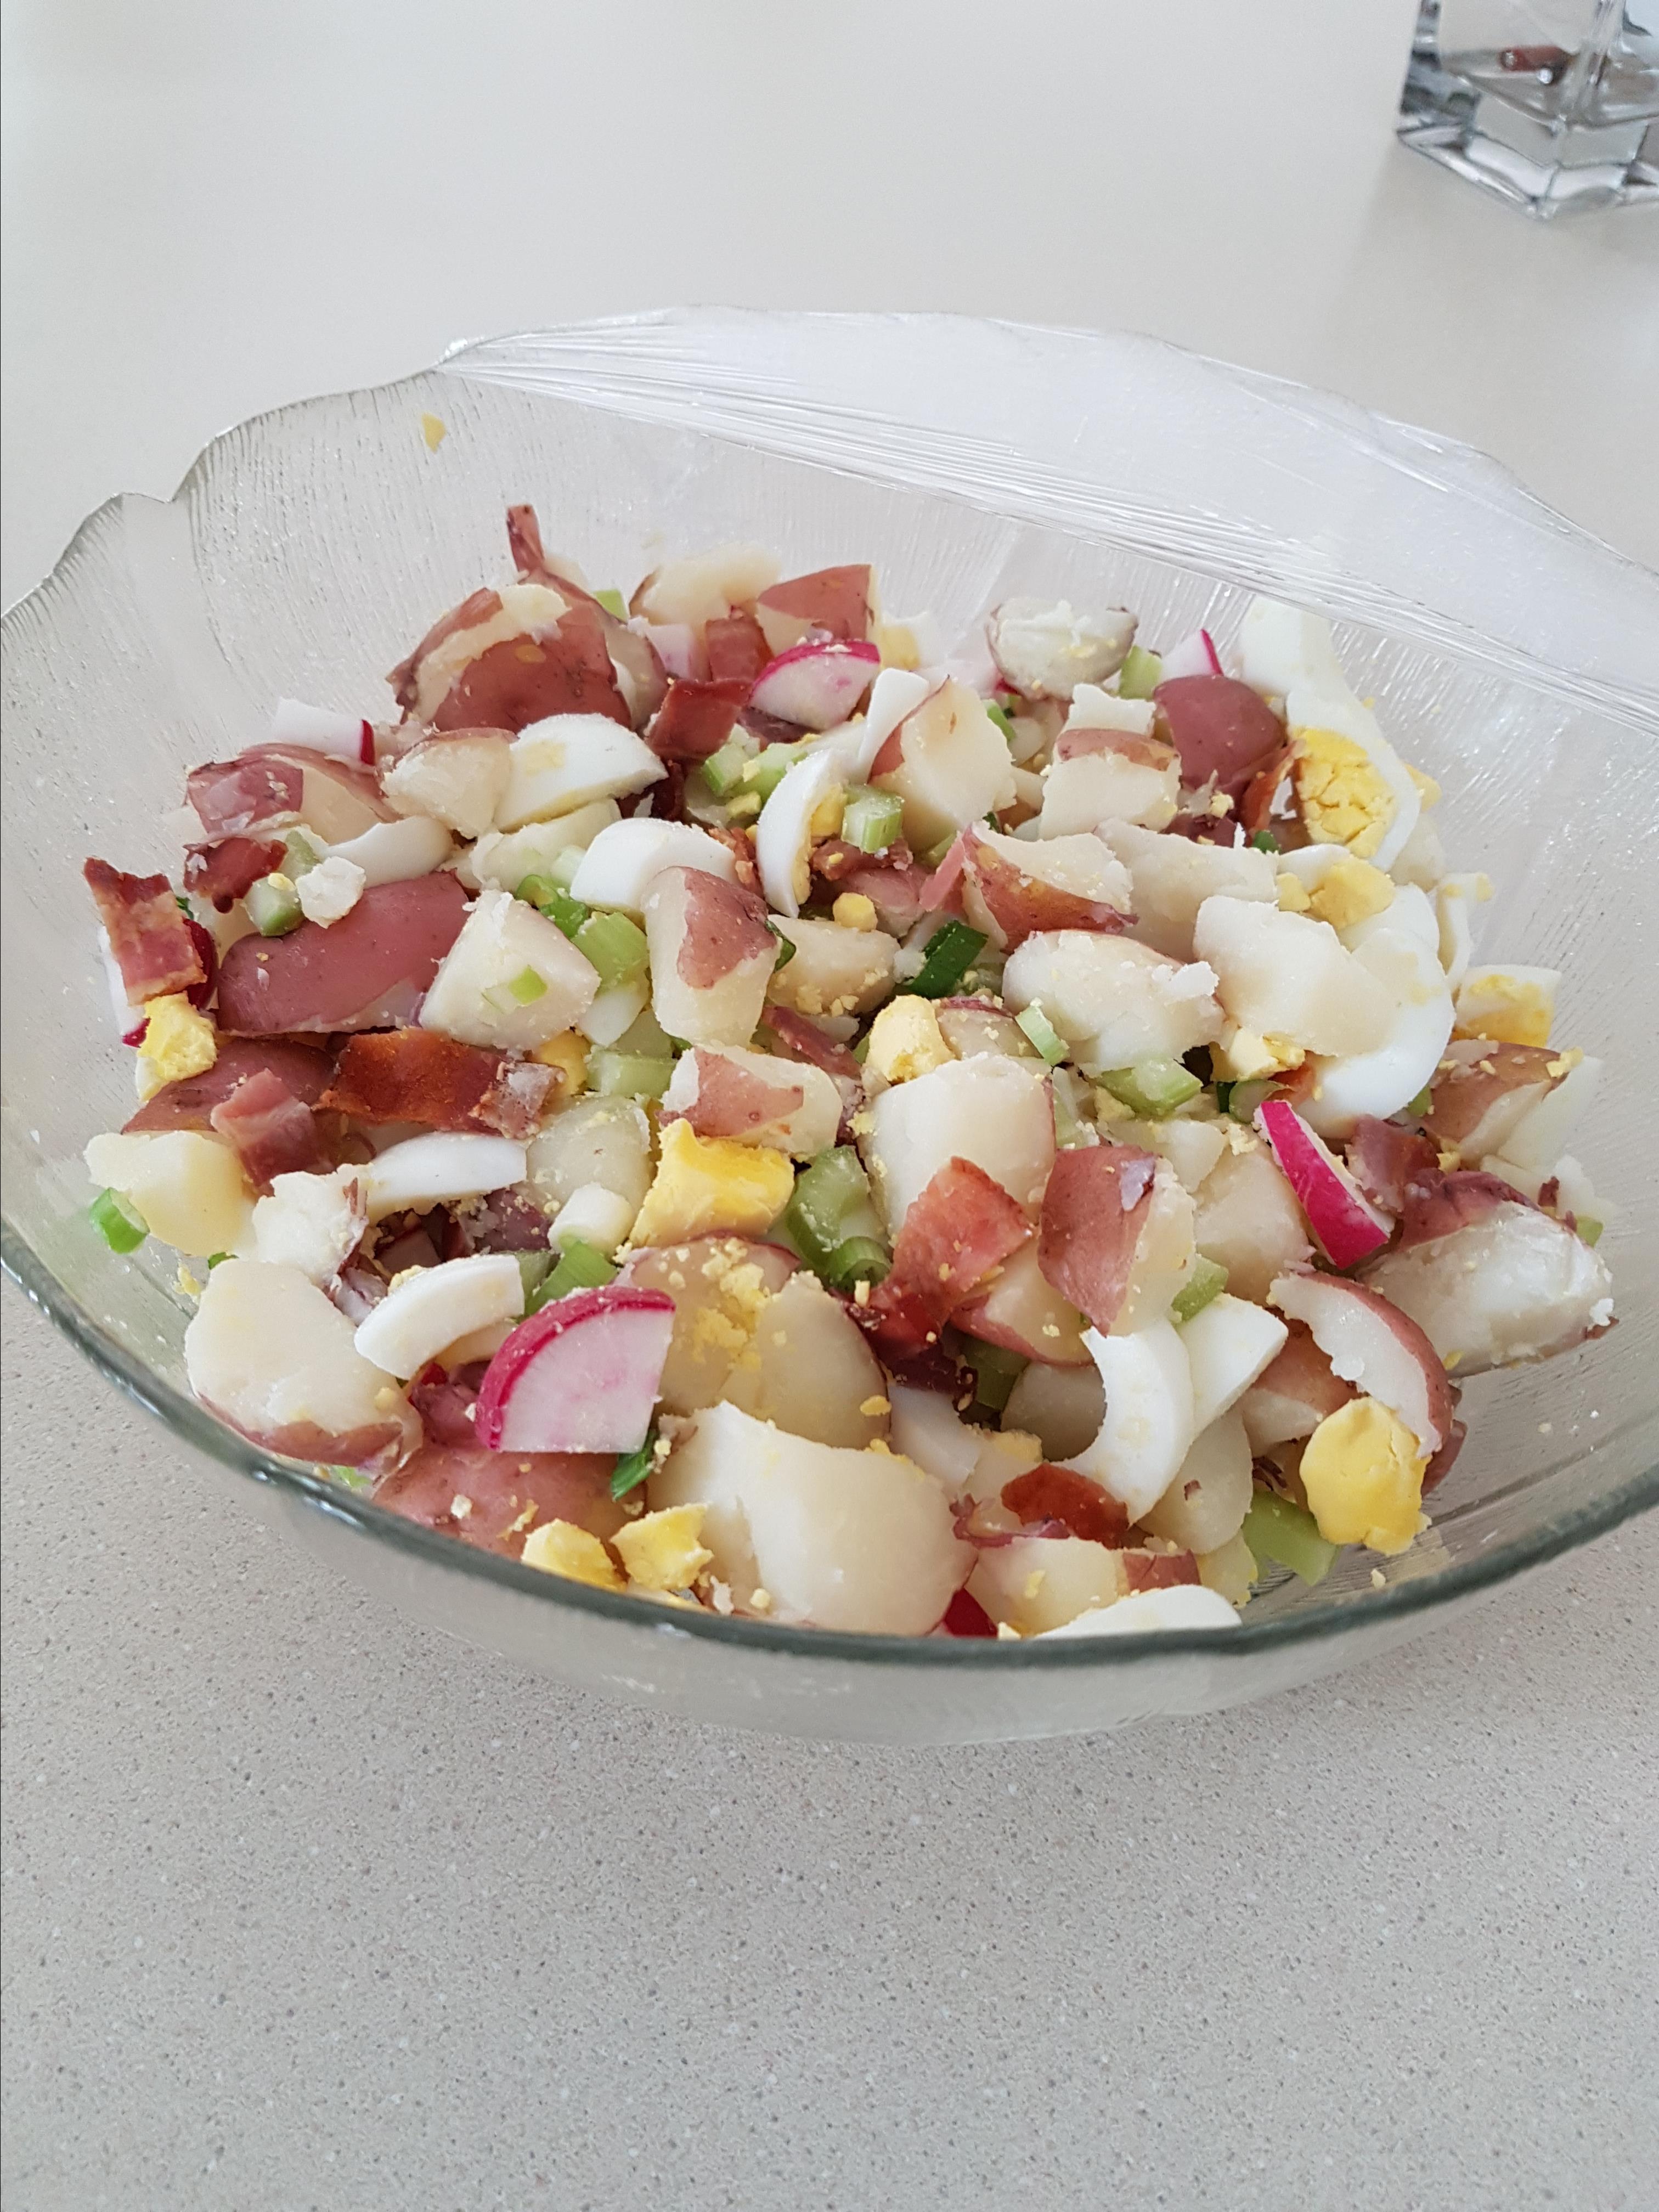 Red Skinned Potato Salad cindersthecat